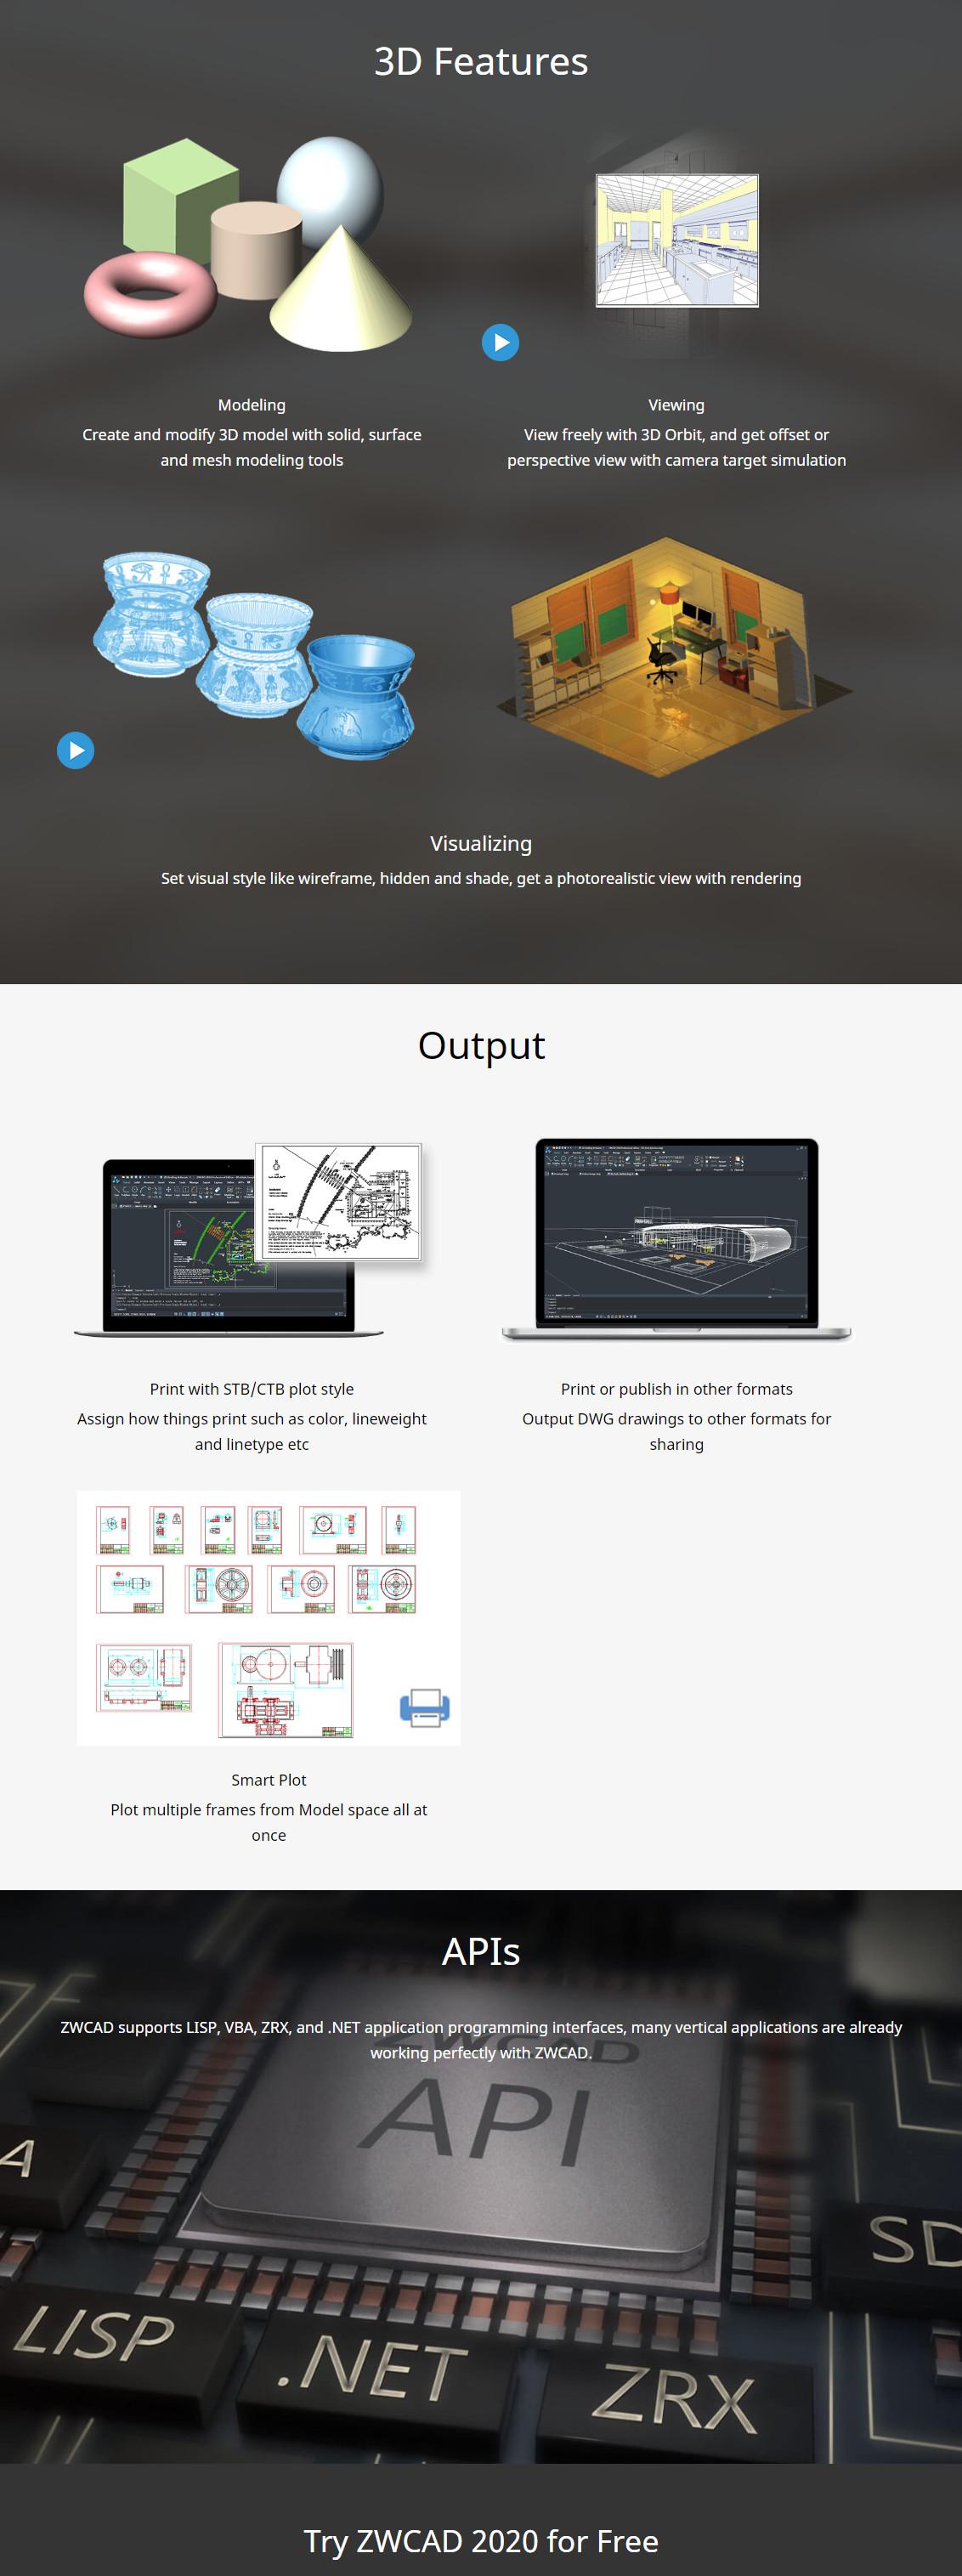 features4.jpg